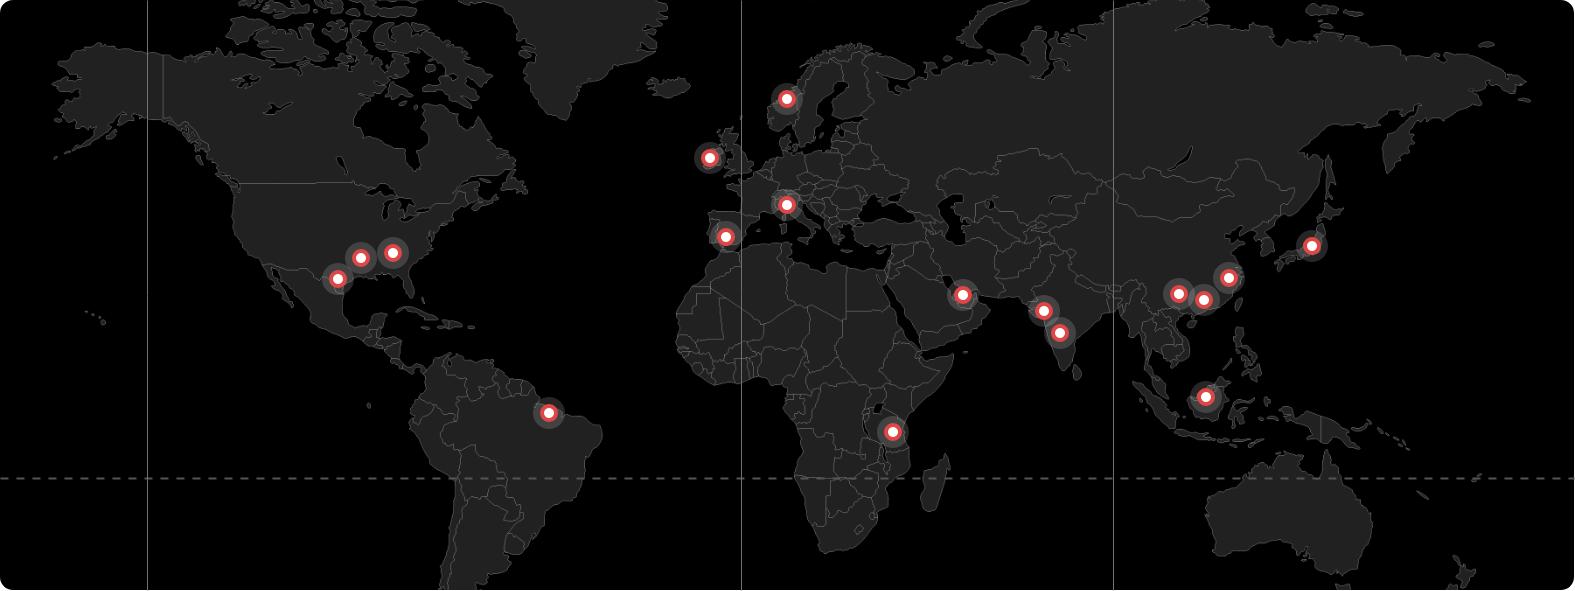 Worldwide Port Congestion Data